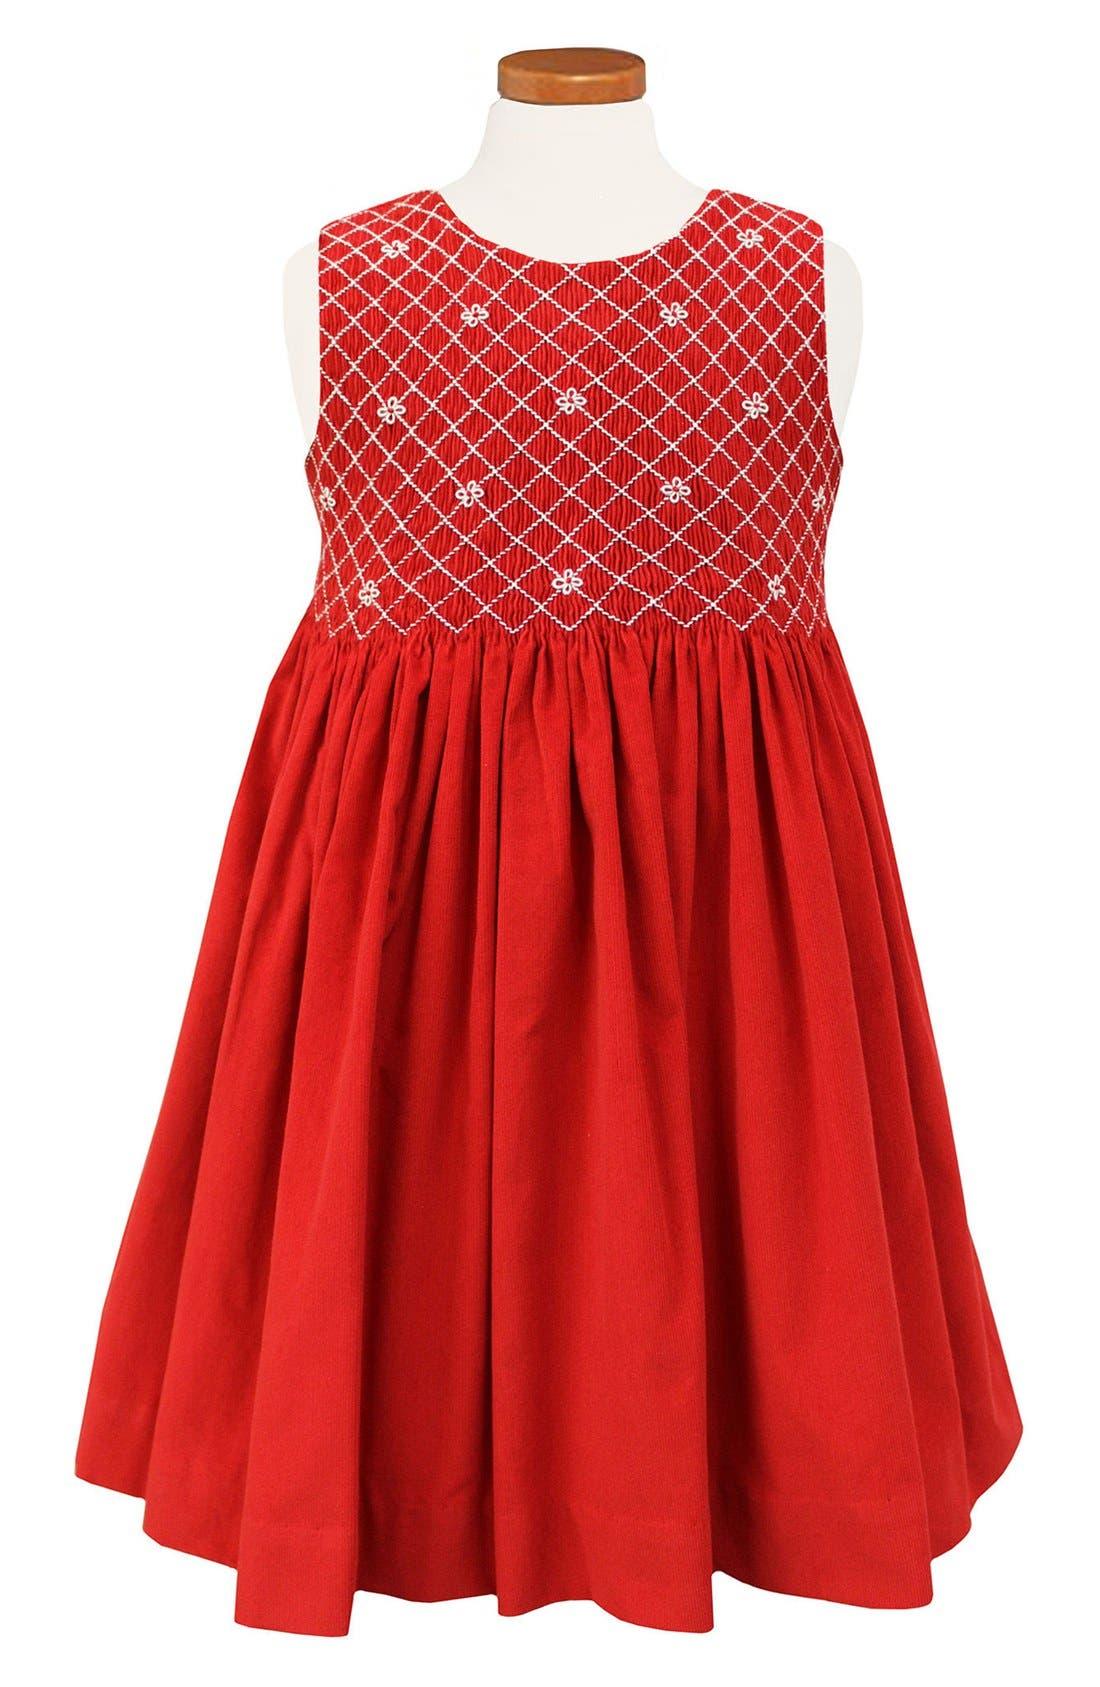 Sorbet Embroidered Smocked Dress (Toddler Girls, Little Girls & Big Girls)